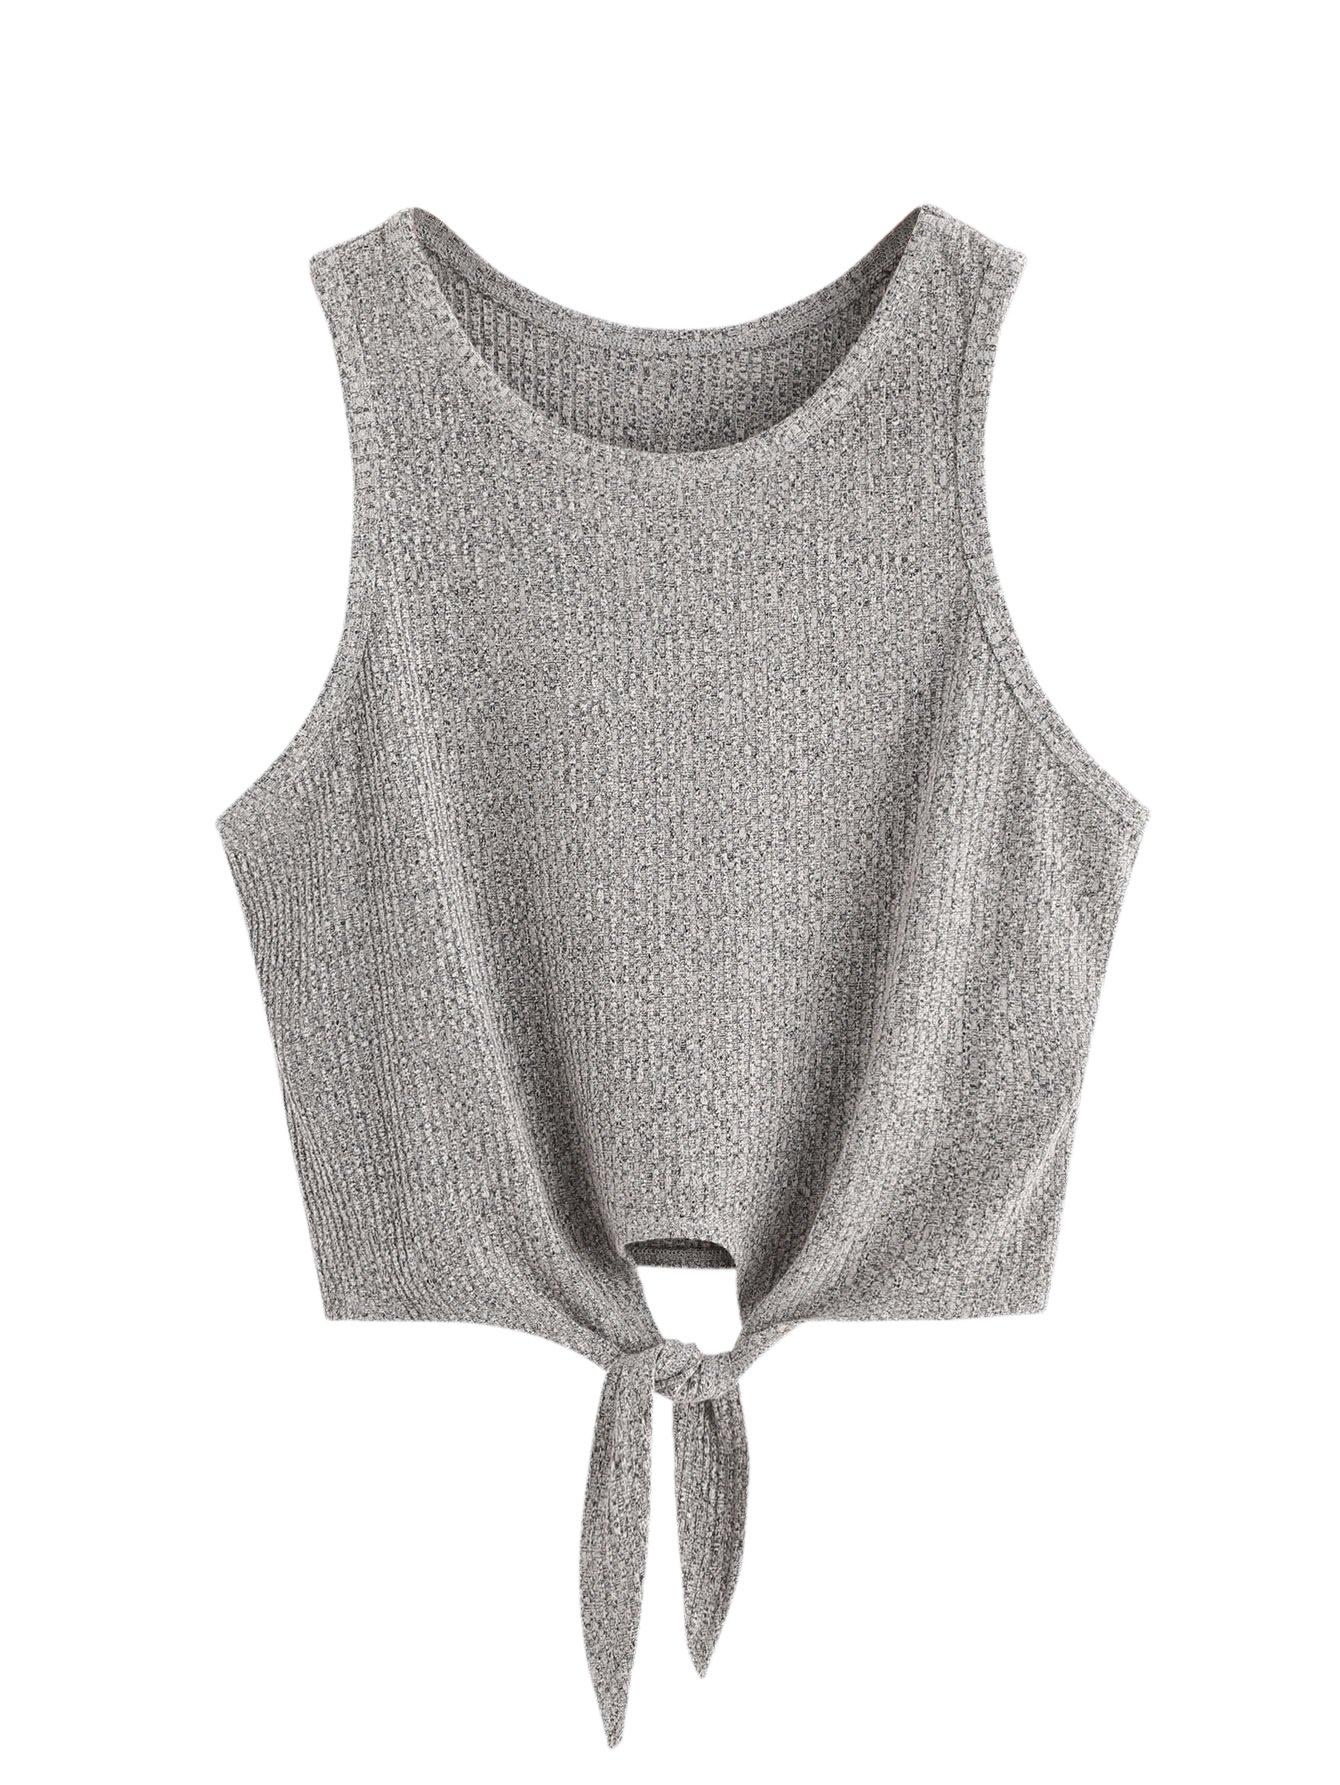 SweatyRocks Crop Top Women Vest Ribbed Tank Top, Grey, Medium